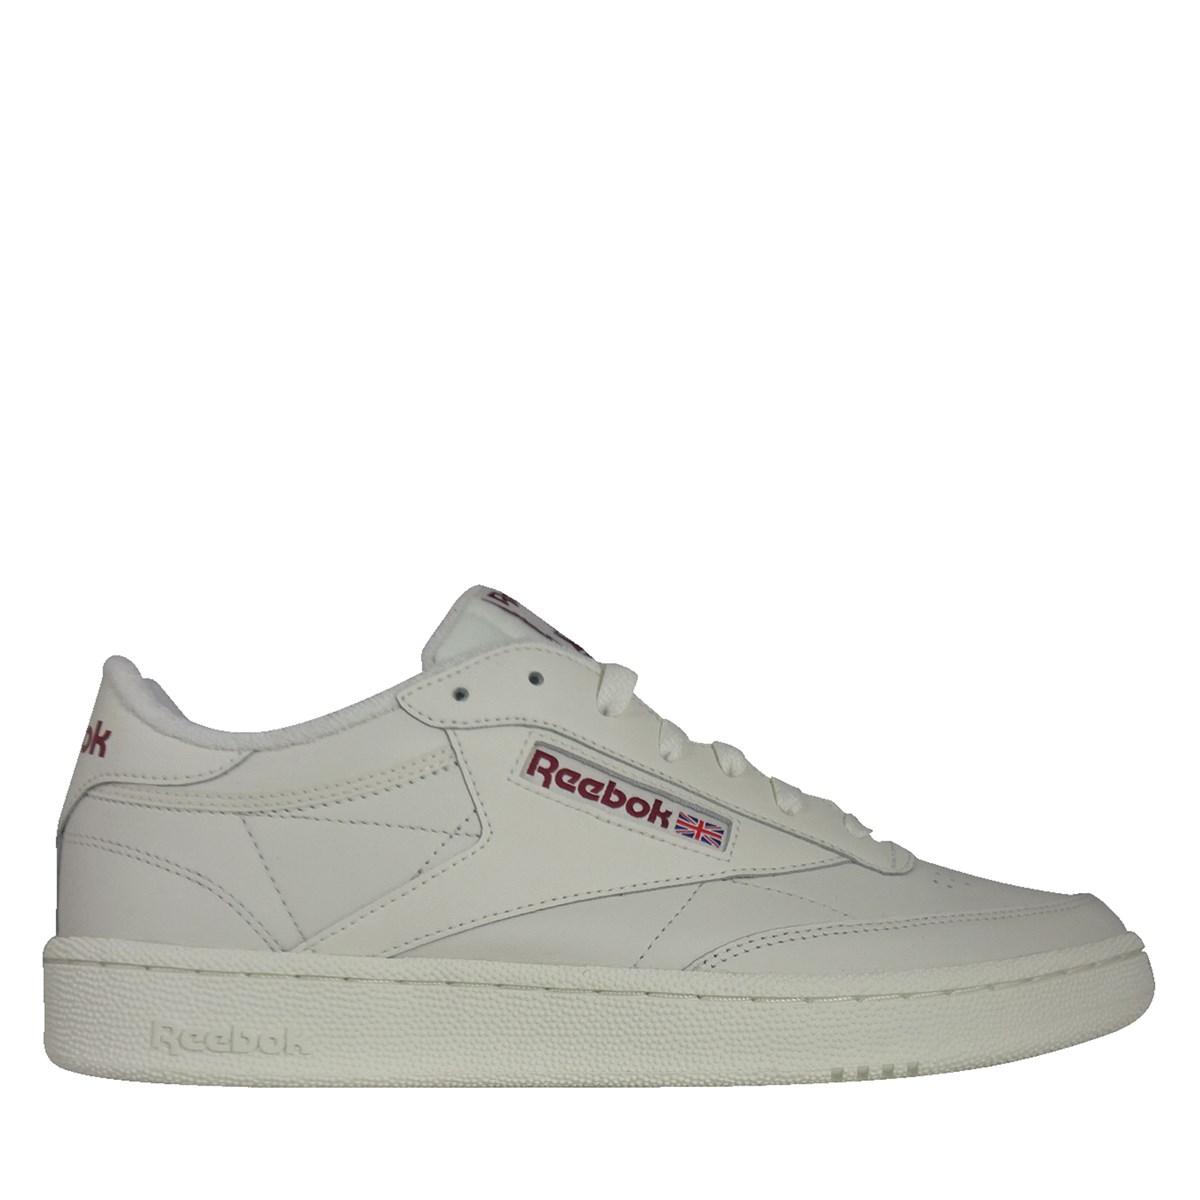 Men's Club C 85 Sneakers in White | Little Burgundy